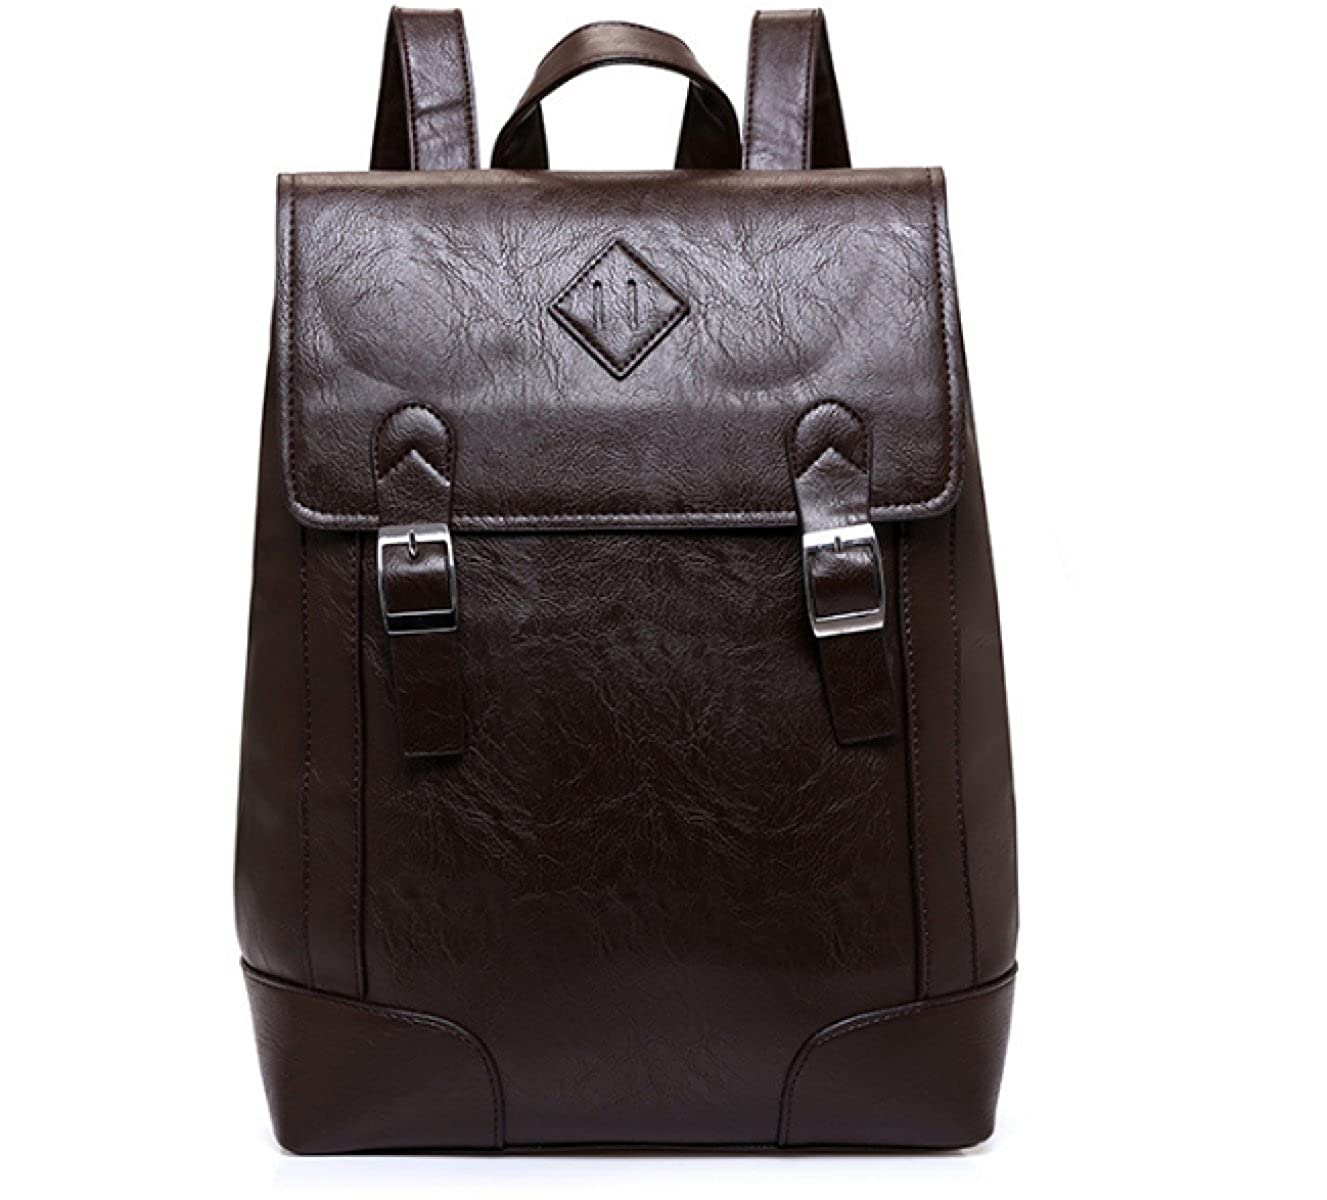 Brown One Size BULAGE Bag Male Bag Man Shoulder Leather Big Bag Outdoors Travel College Student High School Student Schoolbag Fashion Leisure